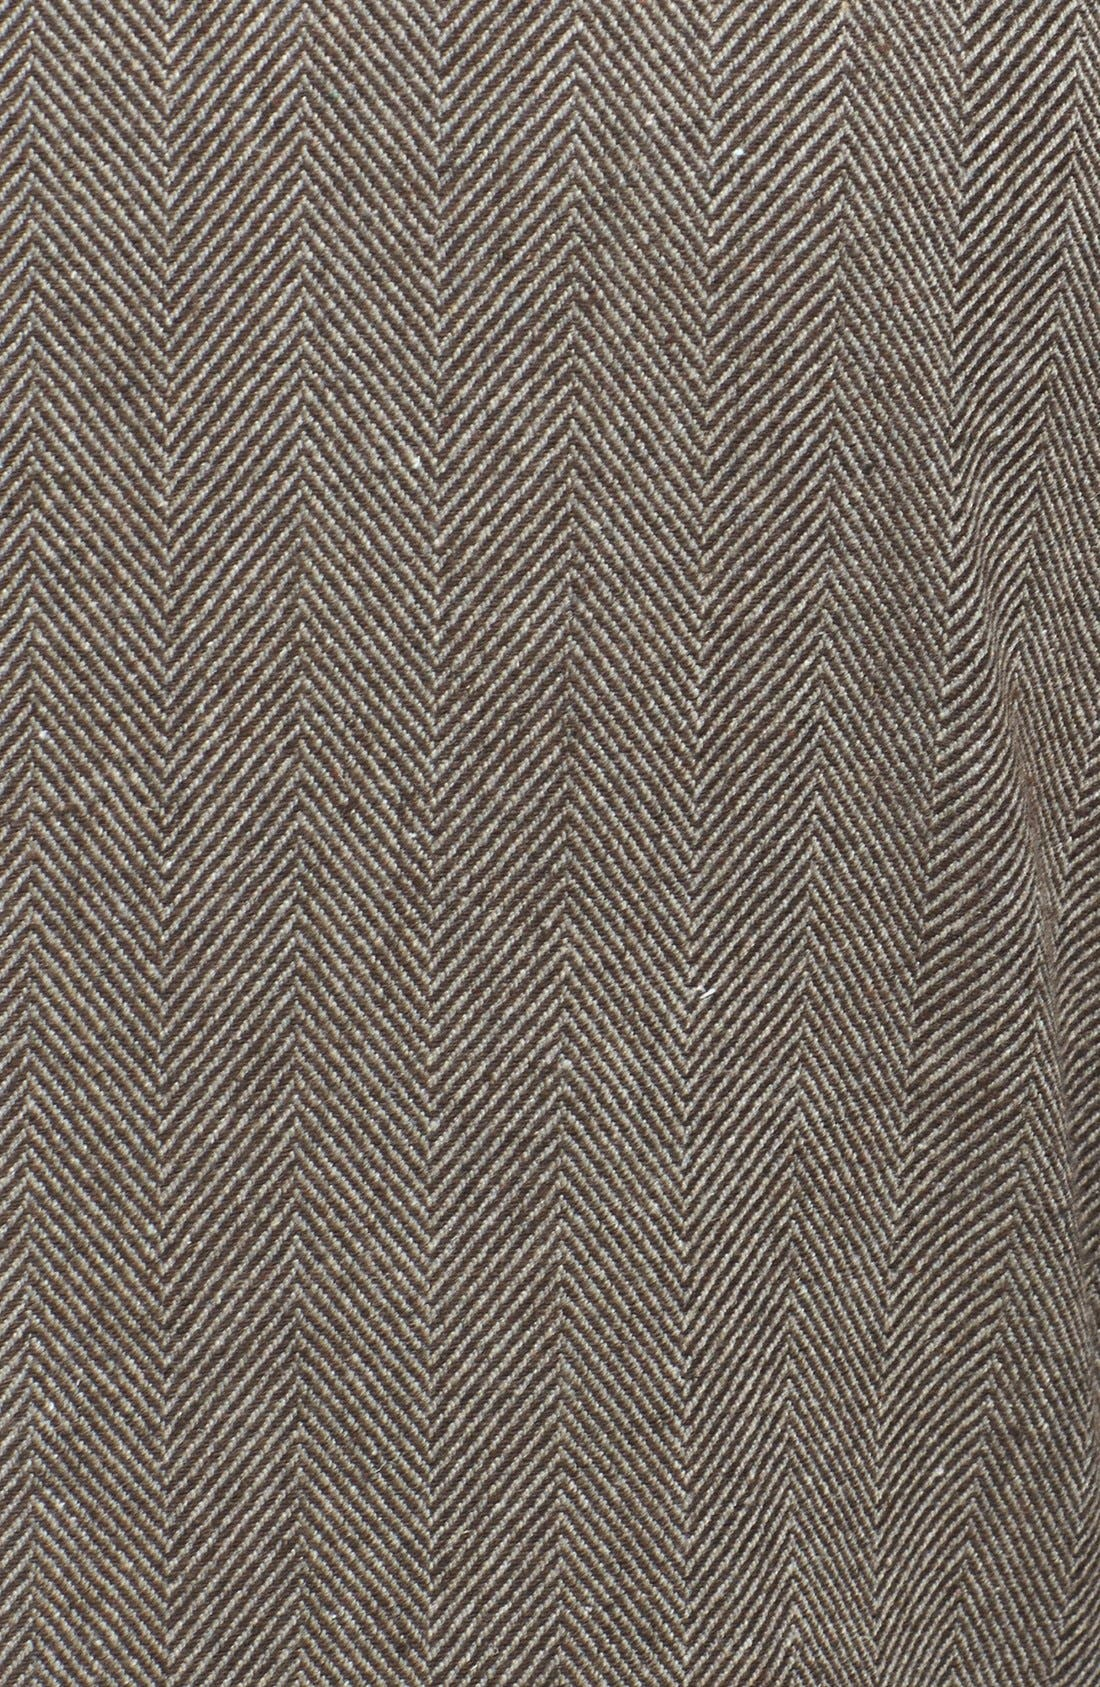 Alternate Image 3  - Kane & Unke Herringbone Jacket